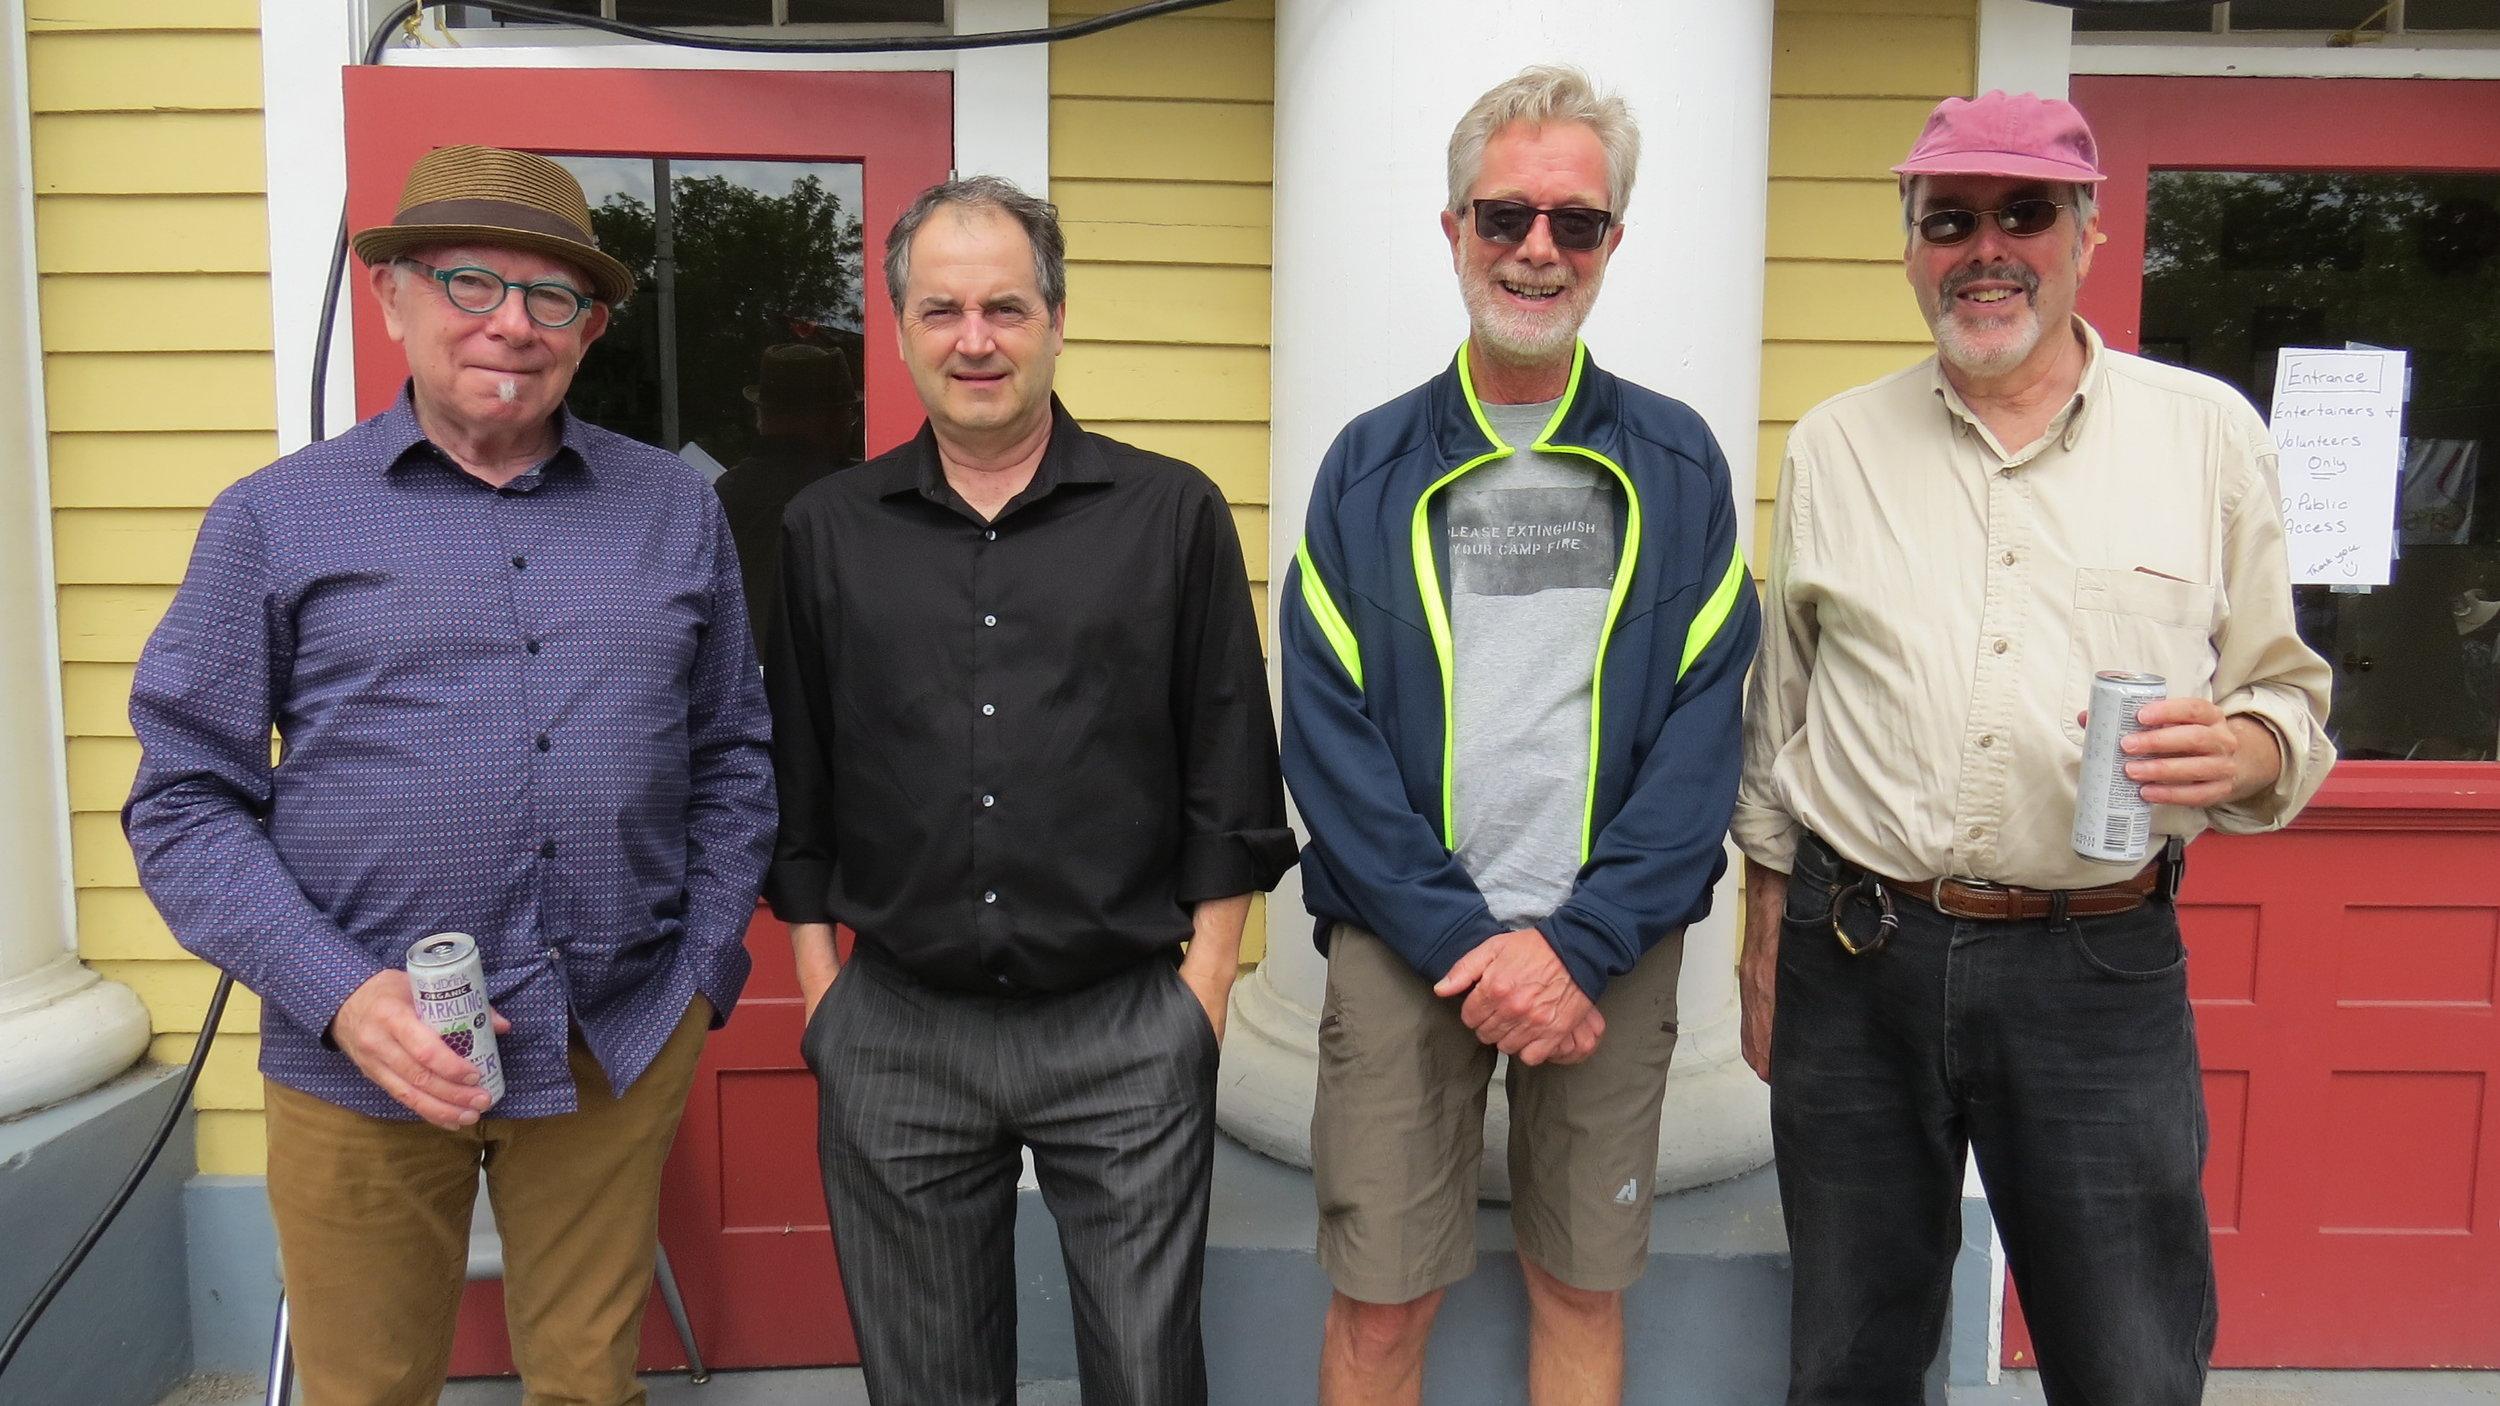 Bill Sample, Tim Stacy, Buff Allen